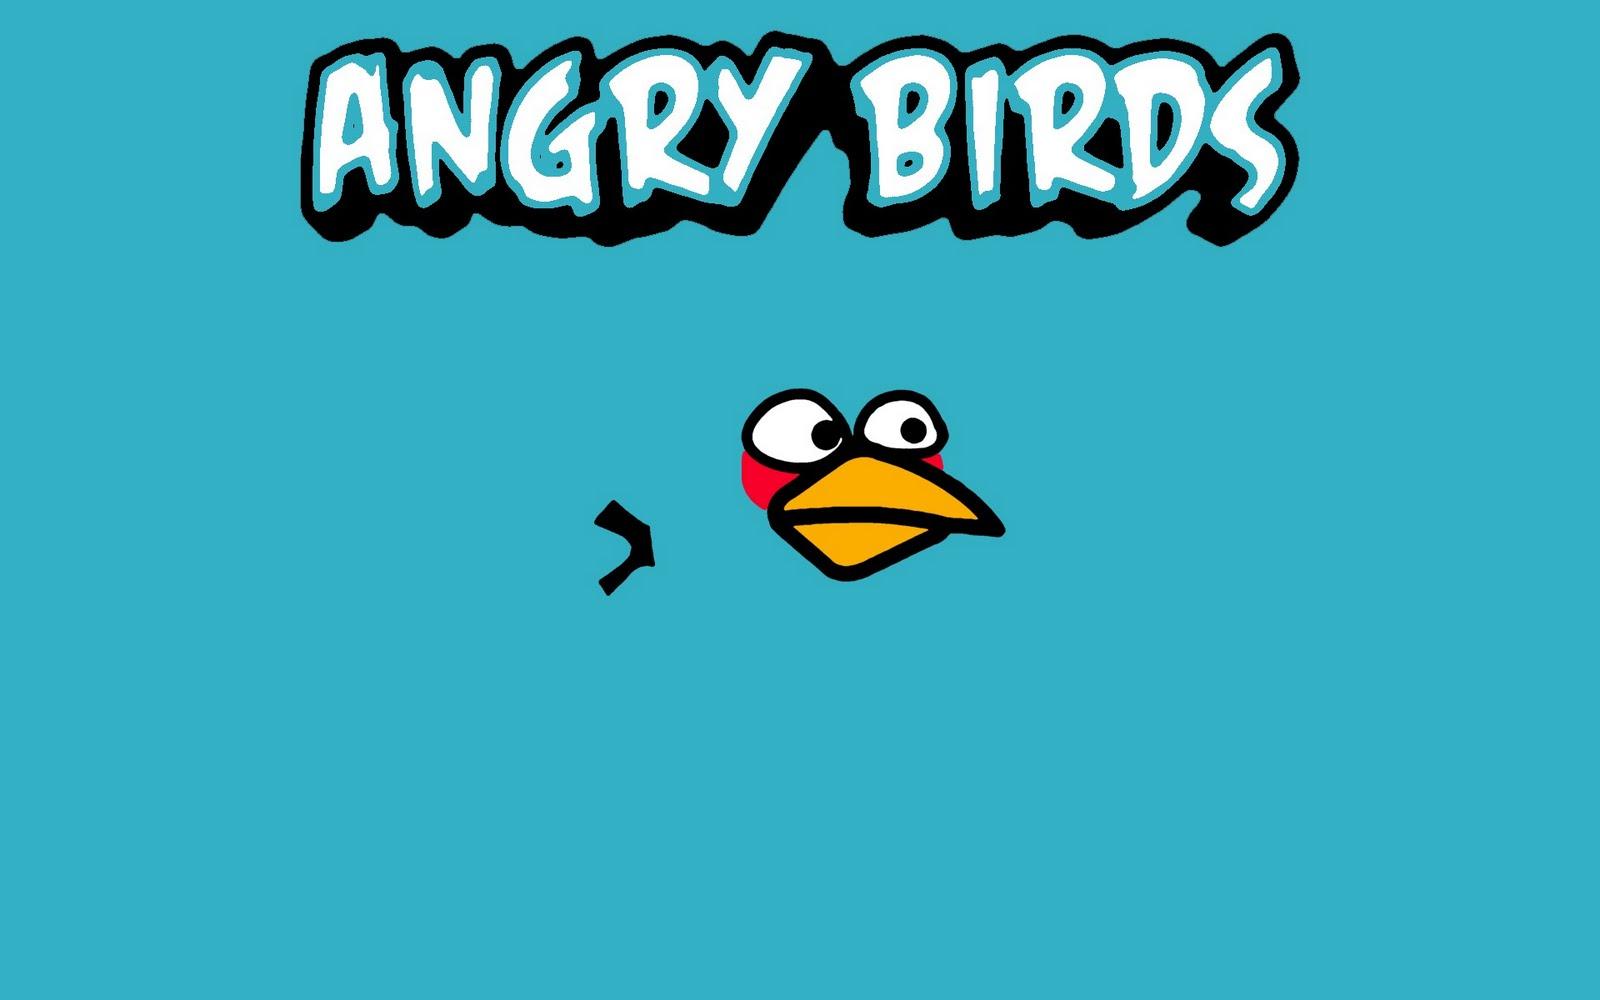 49 Angry Birds Wallpaper Hd On Wallpapersafari